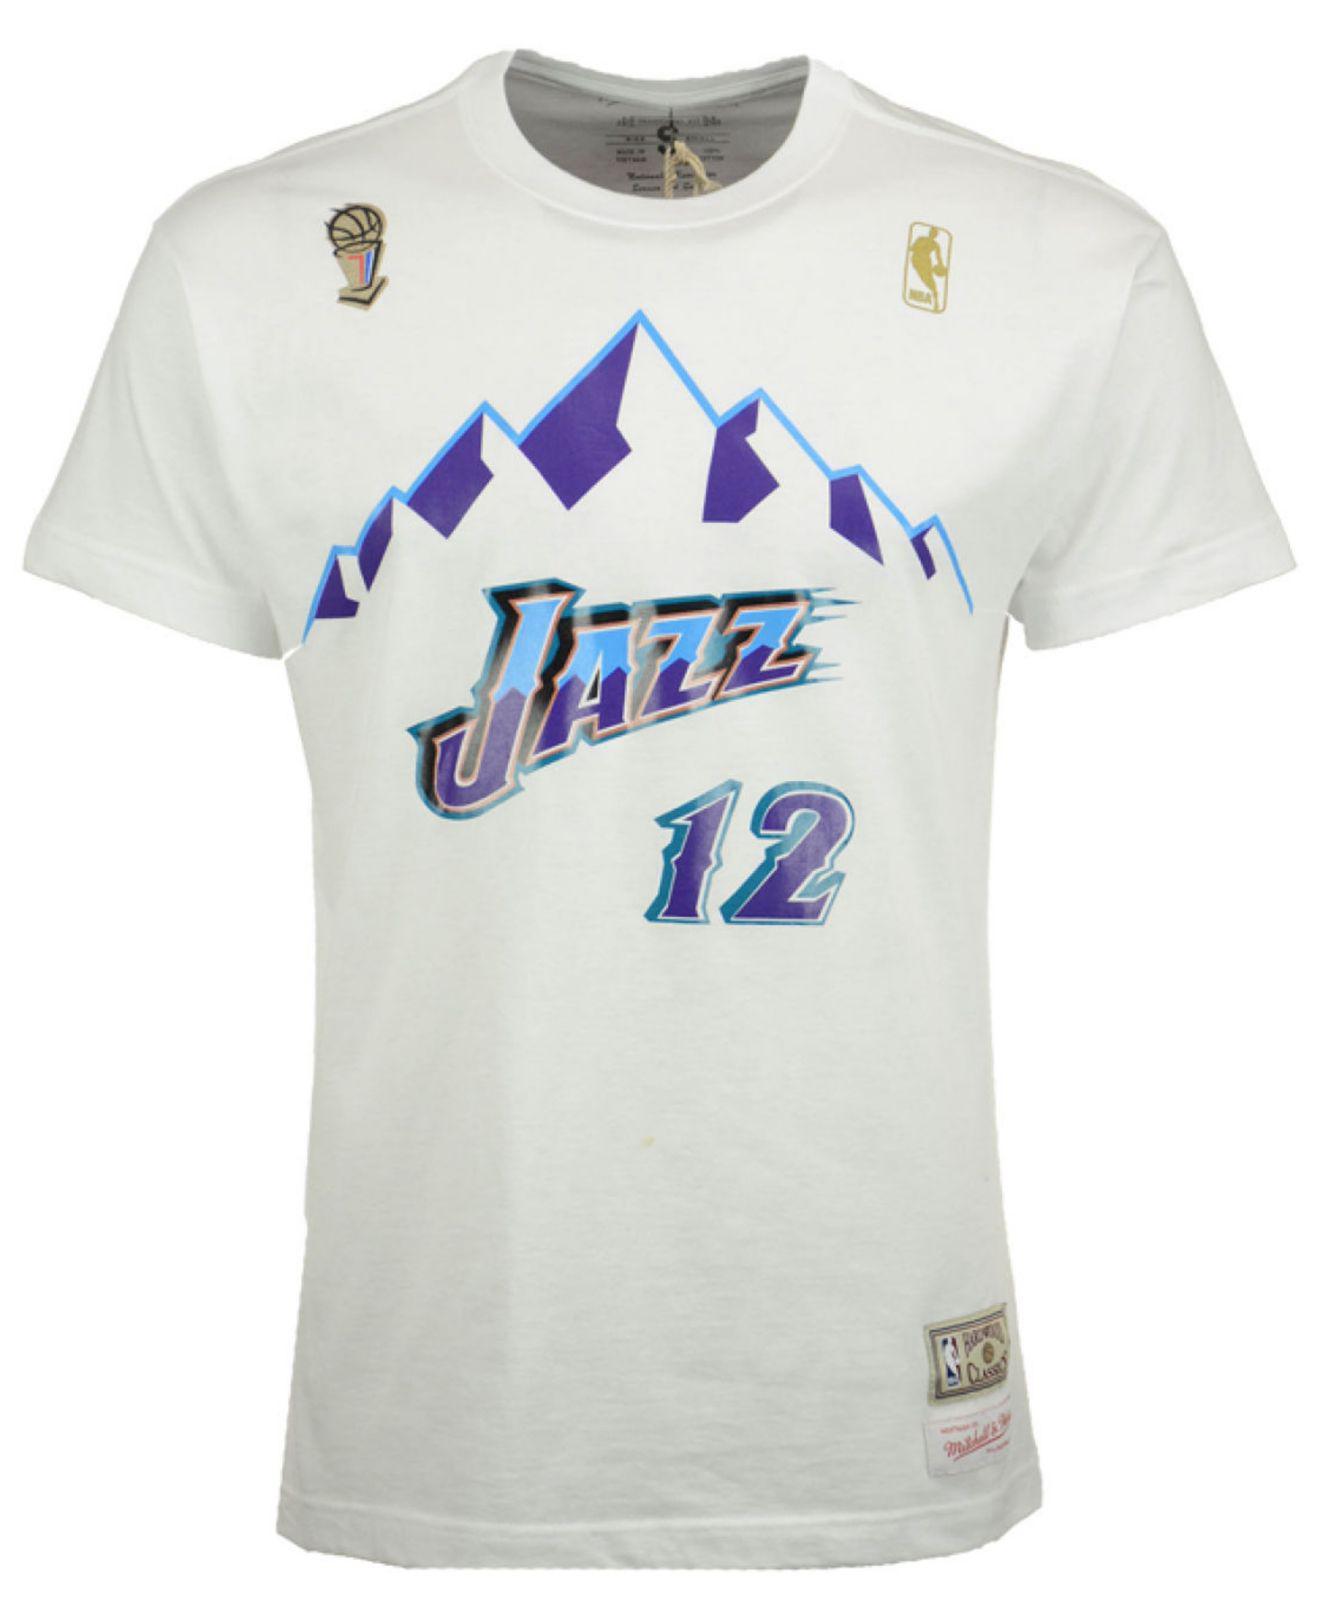 89f33283d Mitchell   Ness John Stockton Utah Jazz Hardwood Classic Player T-shirt in  White for Men - Lyst